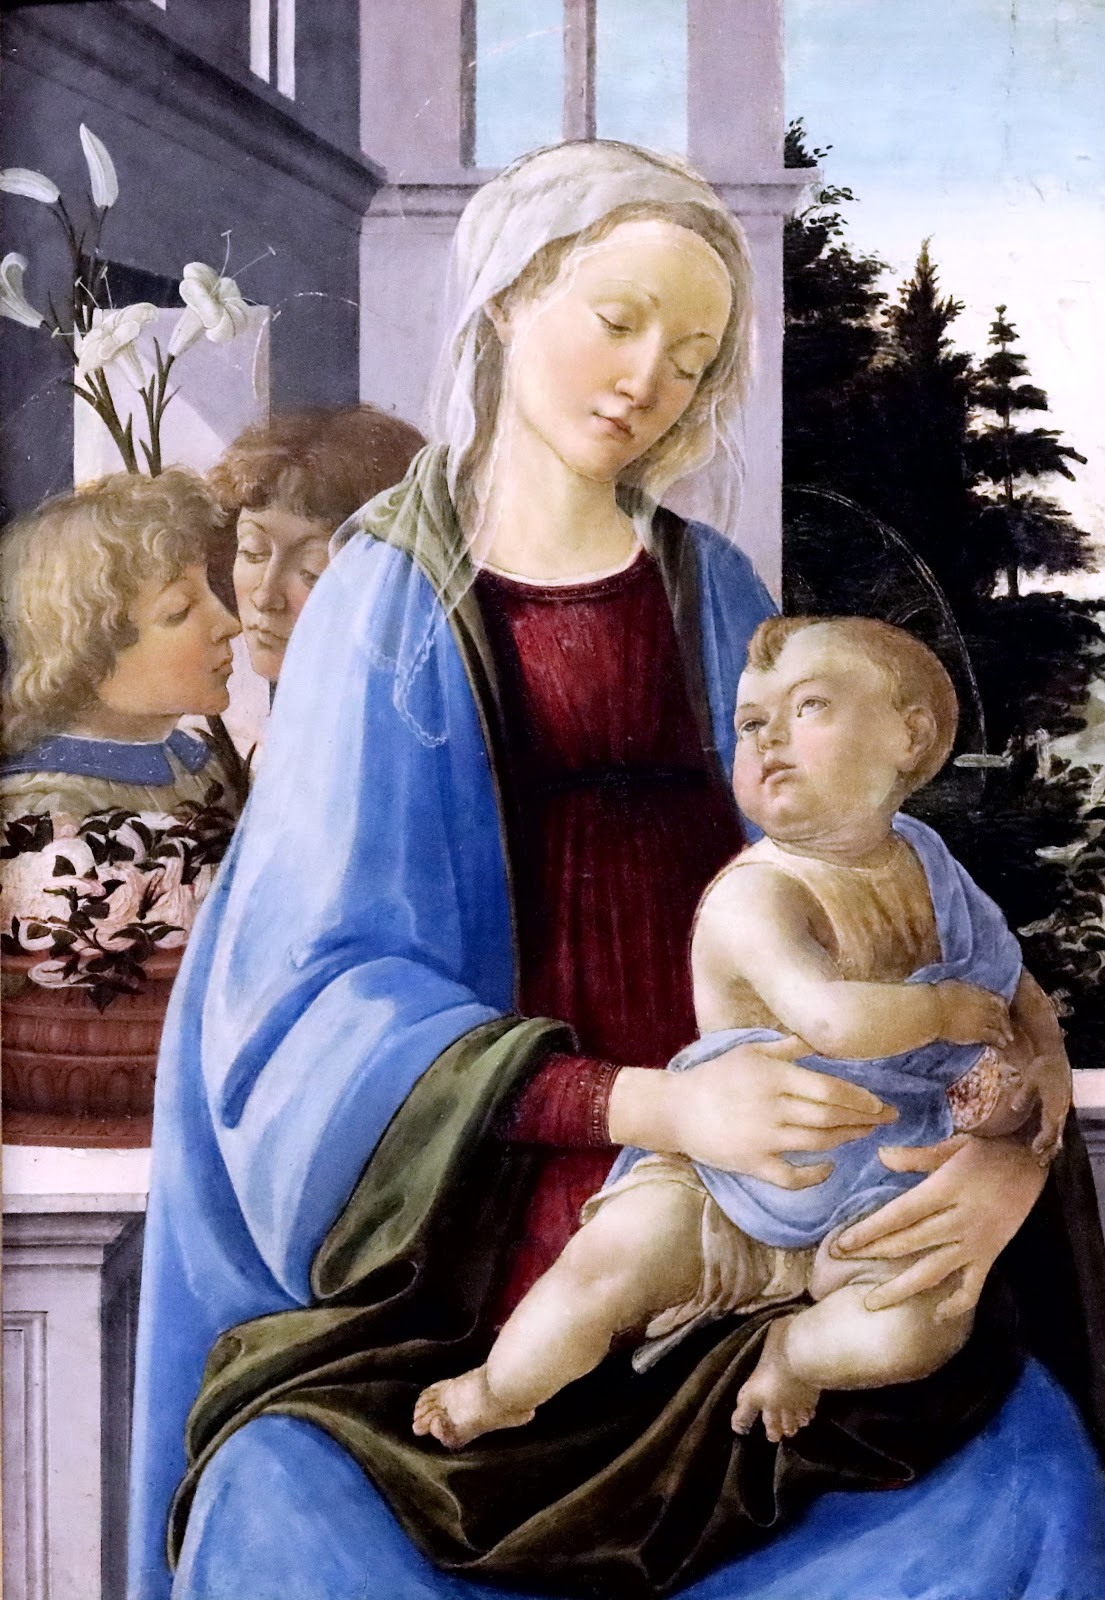 Il garzone della santa polenta directed by roby bianchi - 3 4